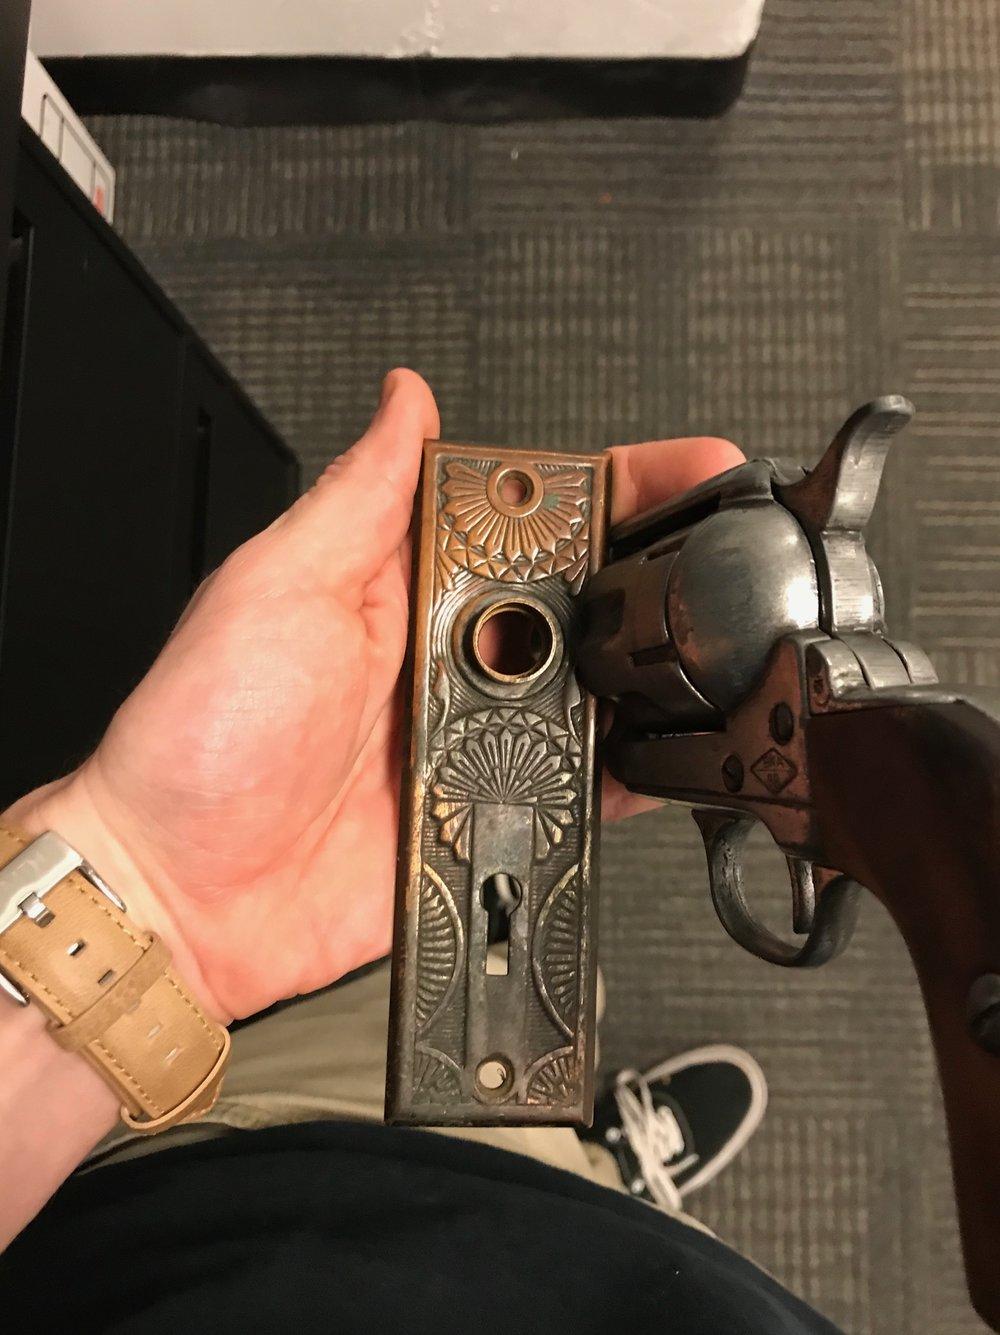 matching the gun to the chosen door key plate